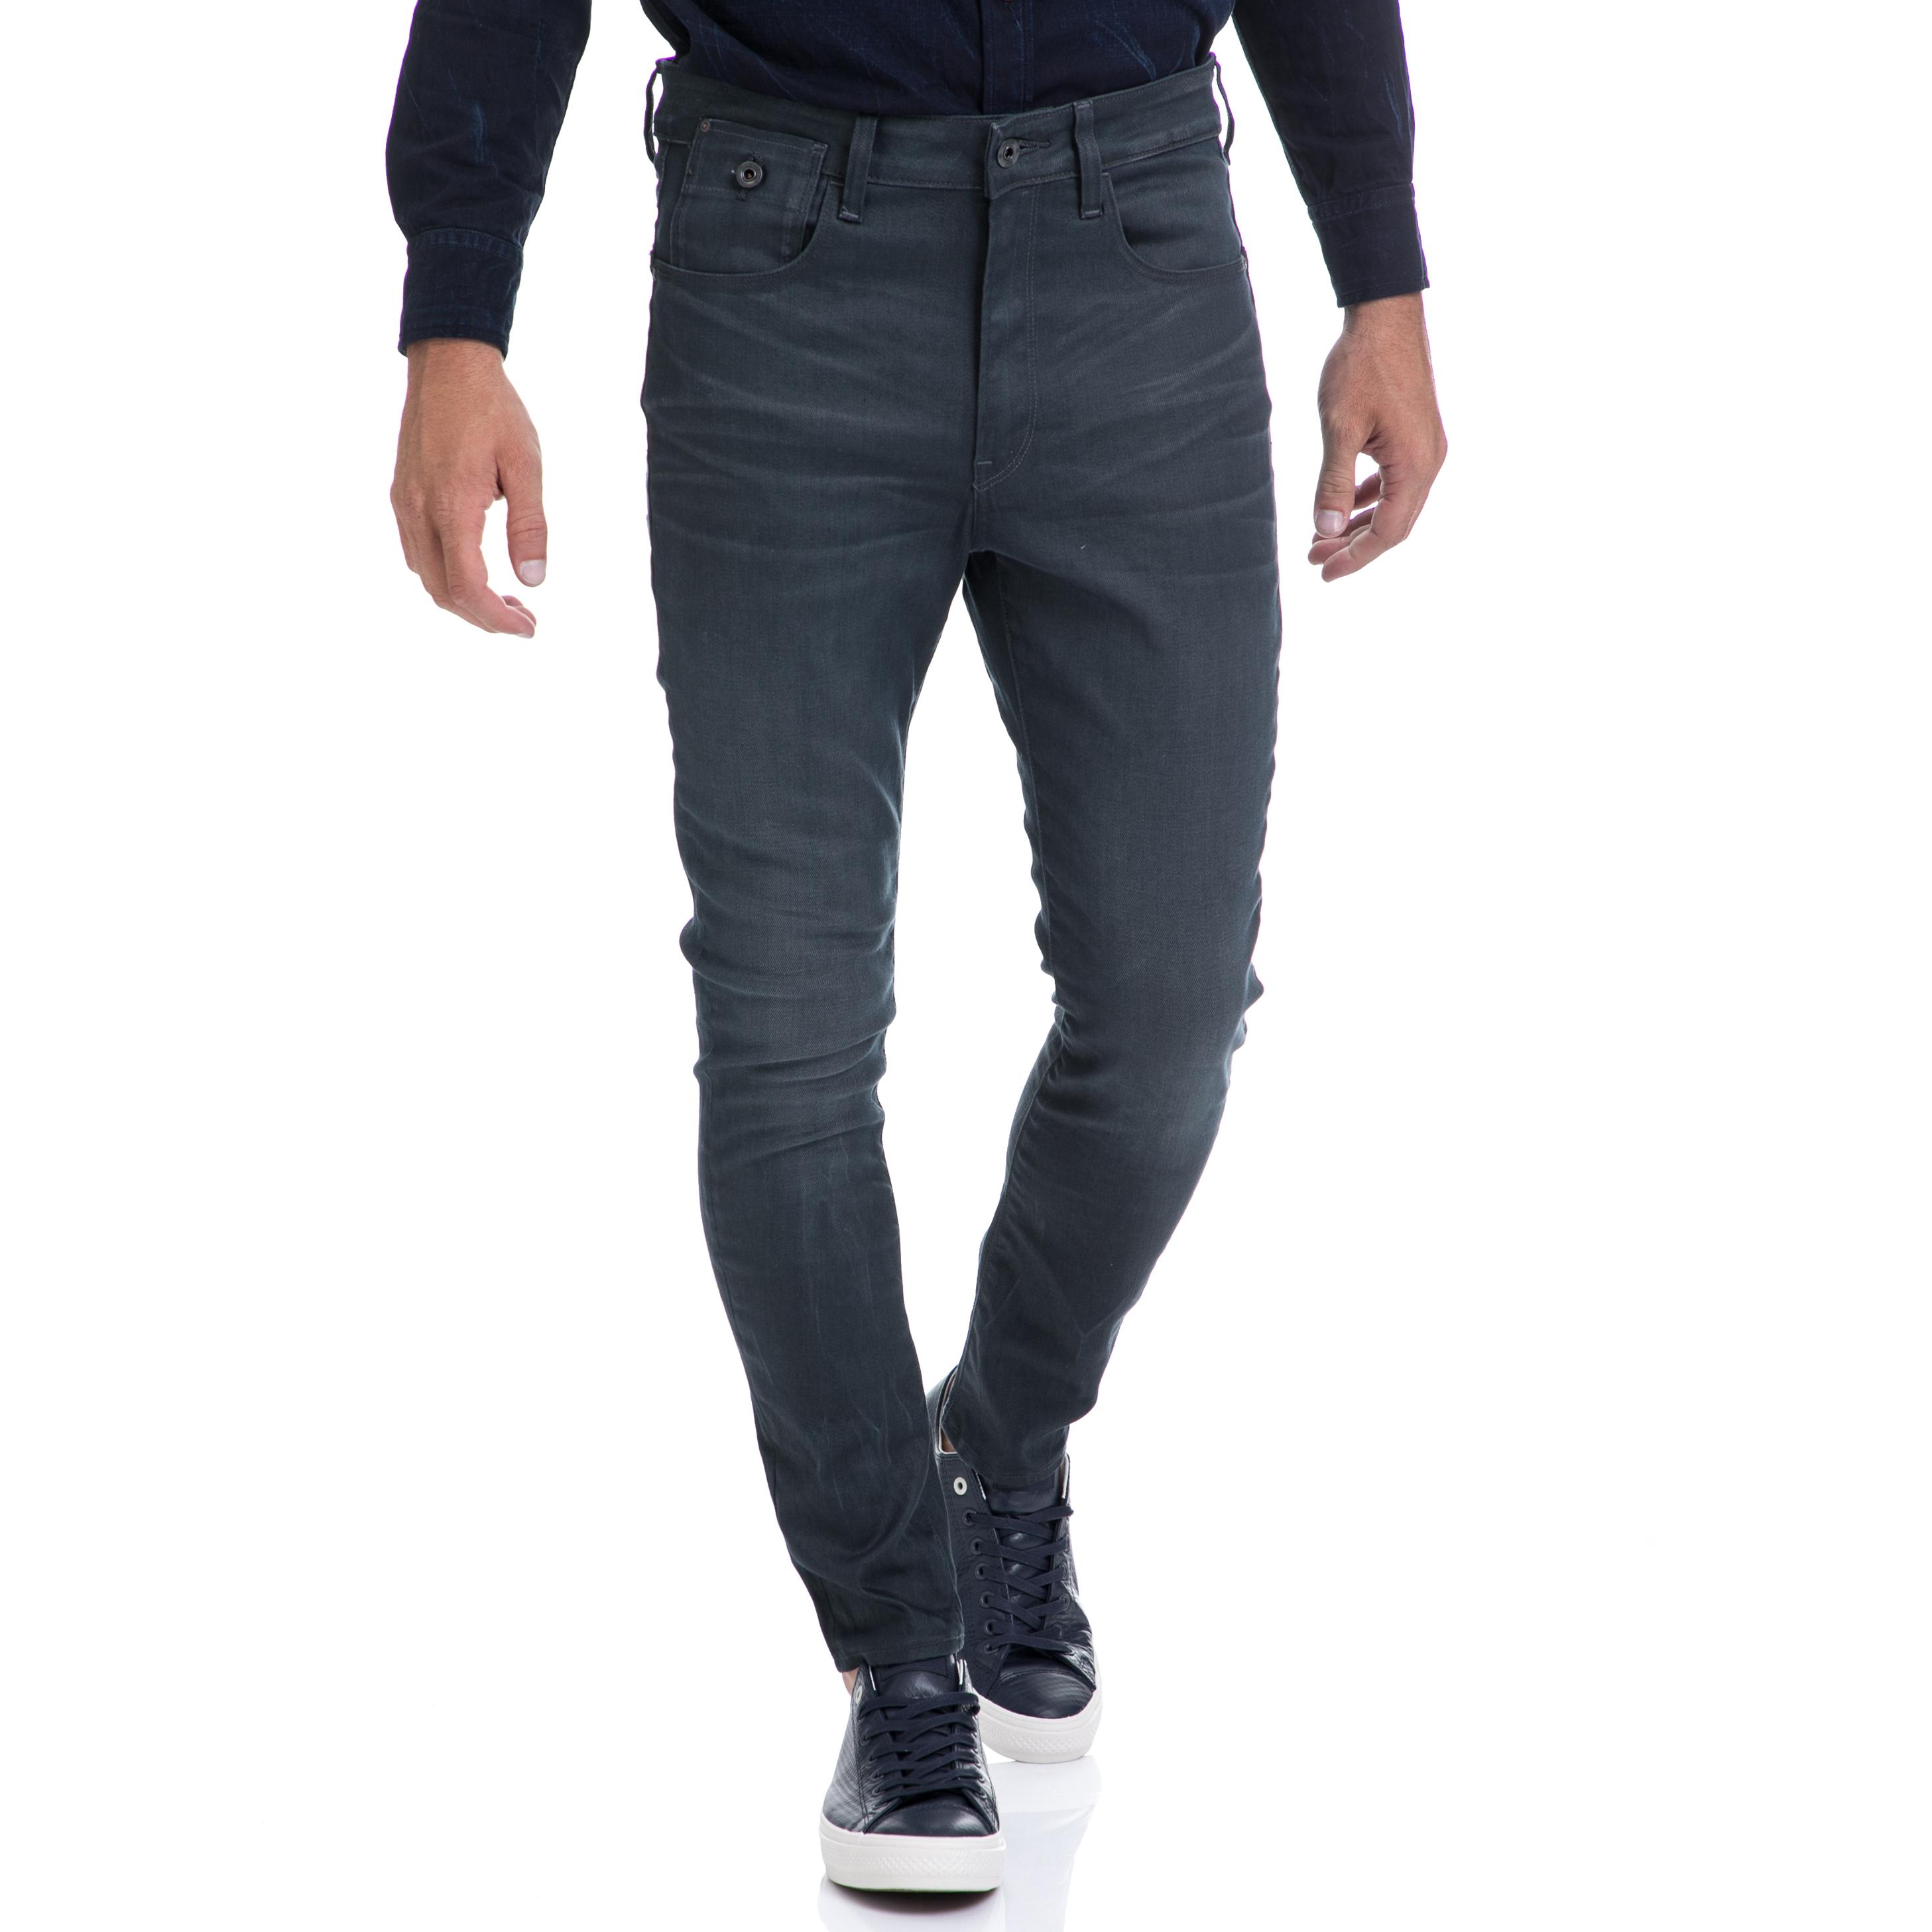 G-STAR RAW - Αντρικό τζιν παντελόνι G-STAR RAW μπλε ανδρικά ρούχα παντελόνια jean